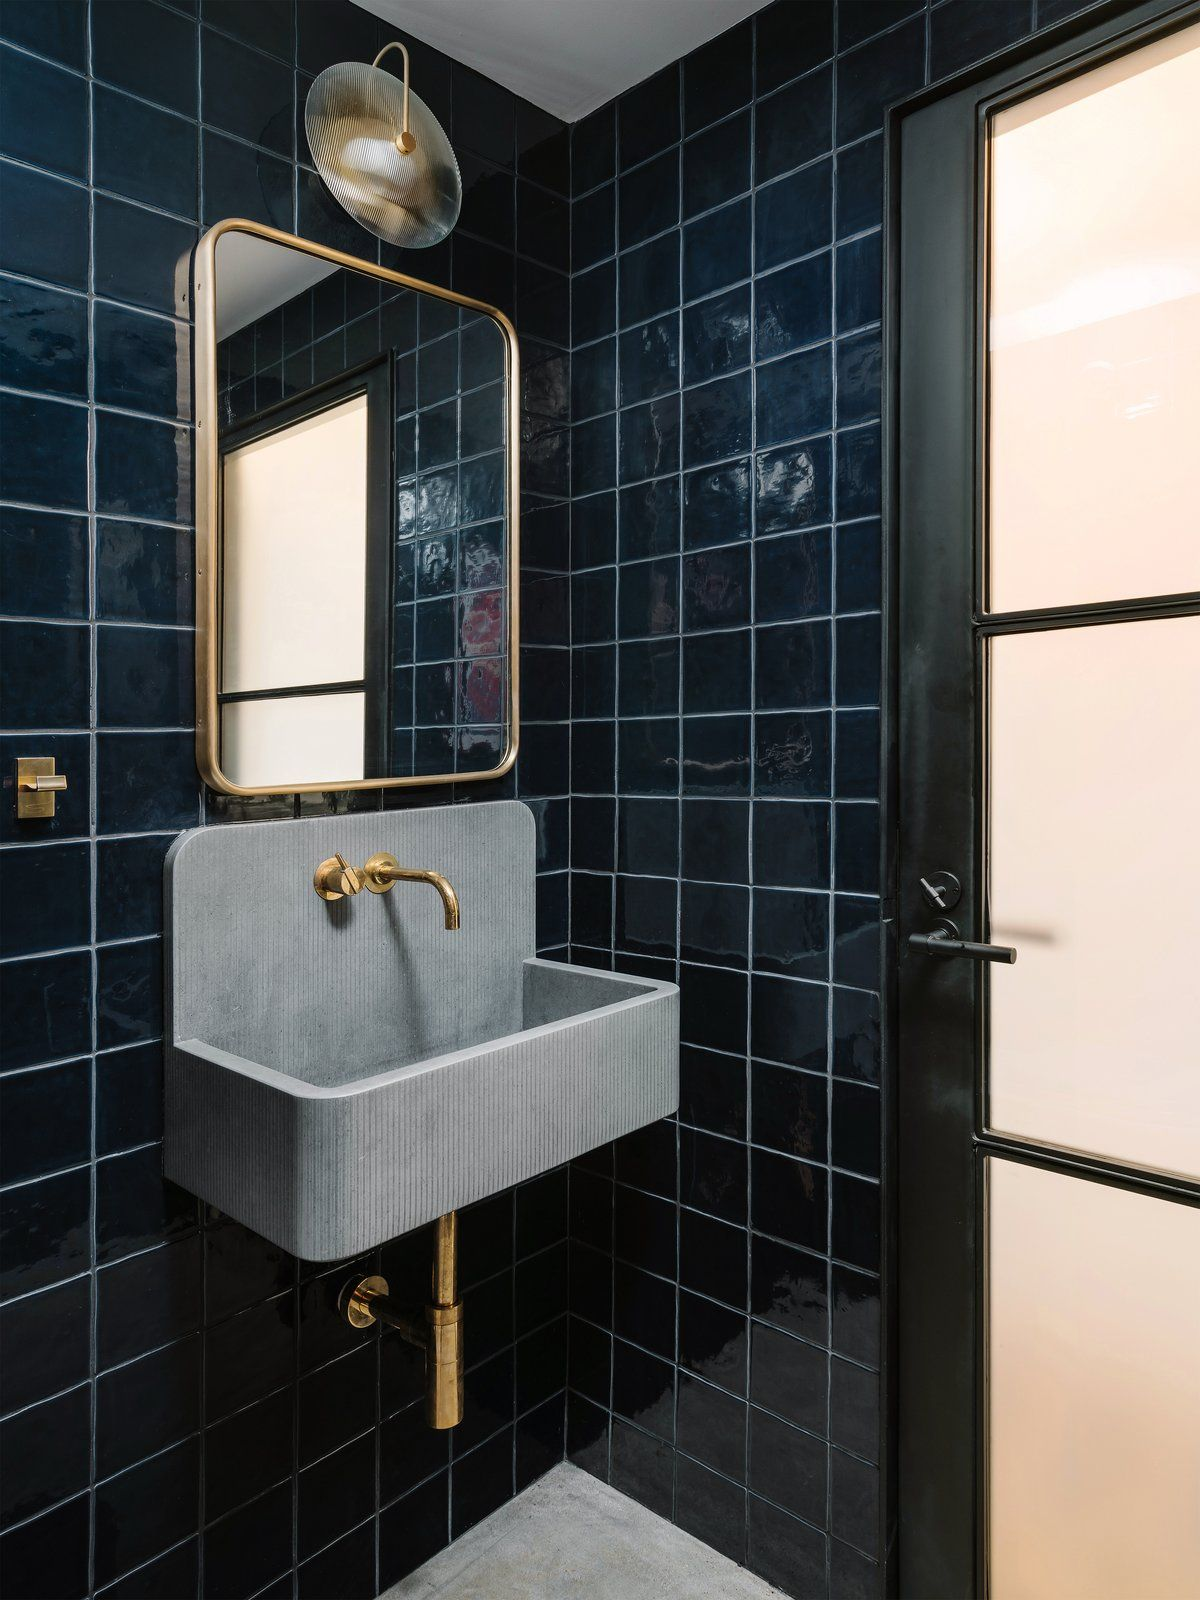 Eva St Loft Remodel By Chioco Design Beautiful Bathroom Designs Bathroom Design Concrete Basin